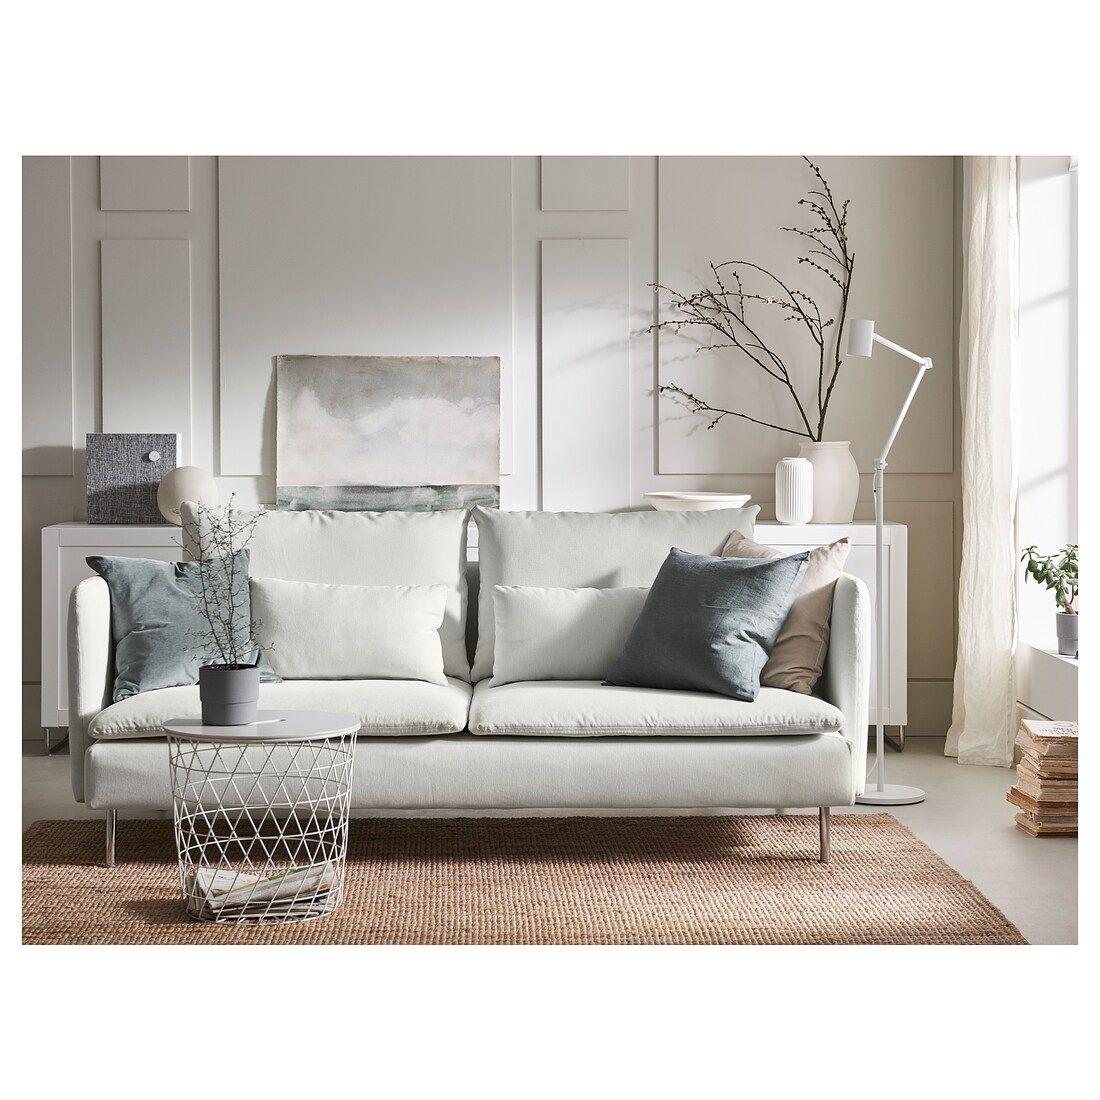 SÖDERHAMN Sofa, Finnsta white IKEA in 2020 White sofa